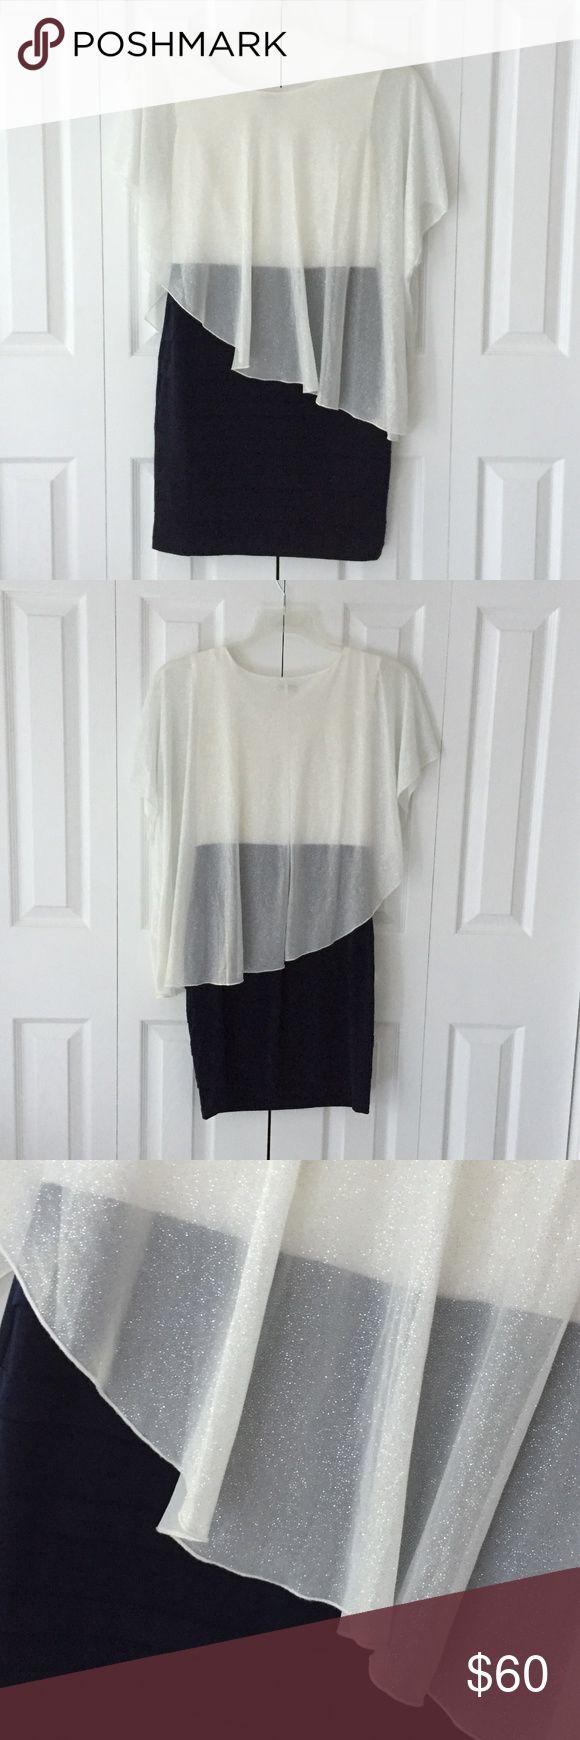 "Womens Enfocus Studio dress Womens Enfocus Studio BLack and White dress With sheer sparkly cape top  Length: 33"" Condition: New Enfocus Studio Dresses Wedding"